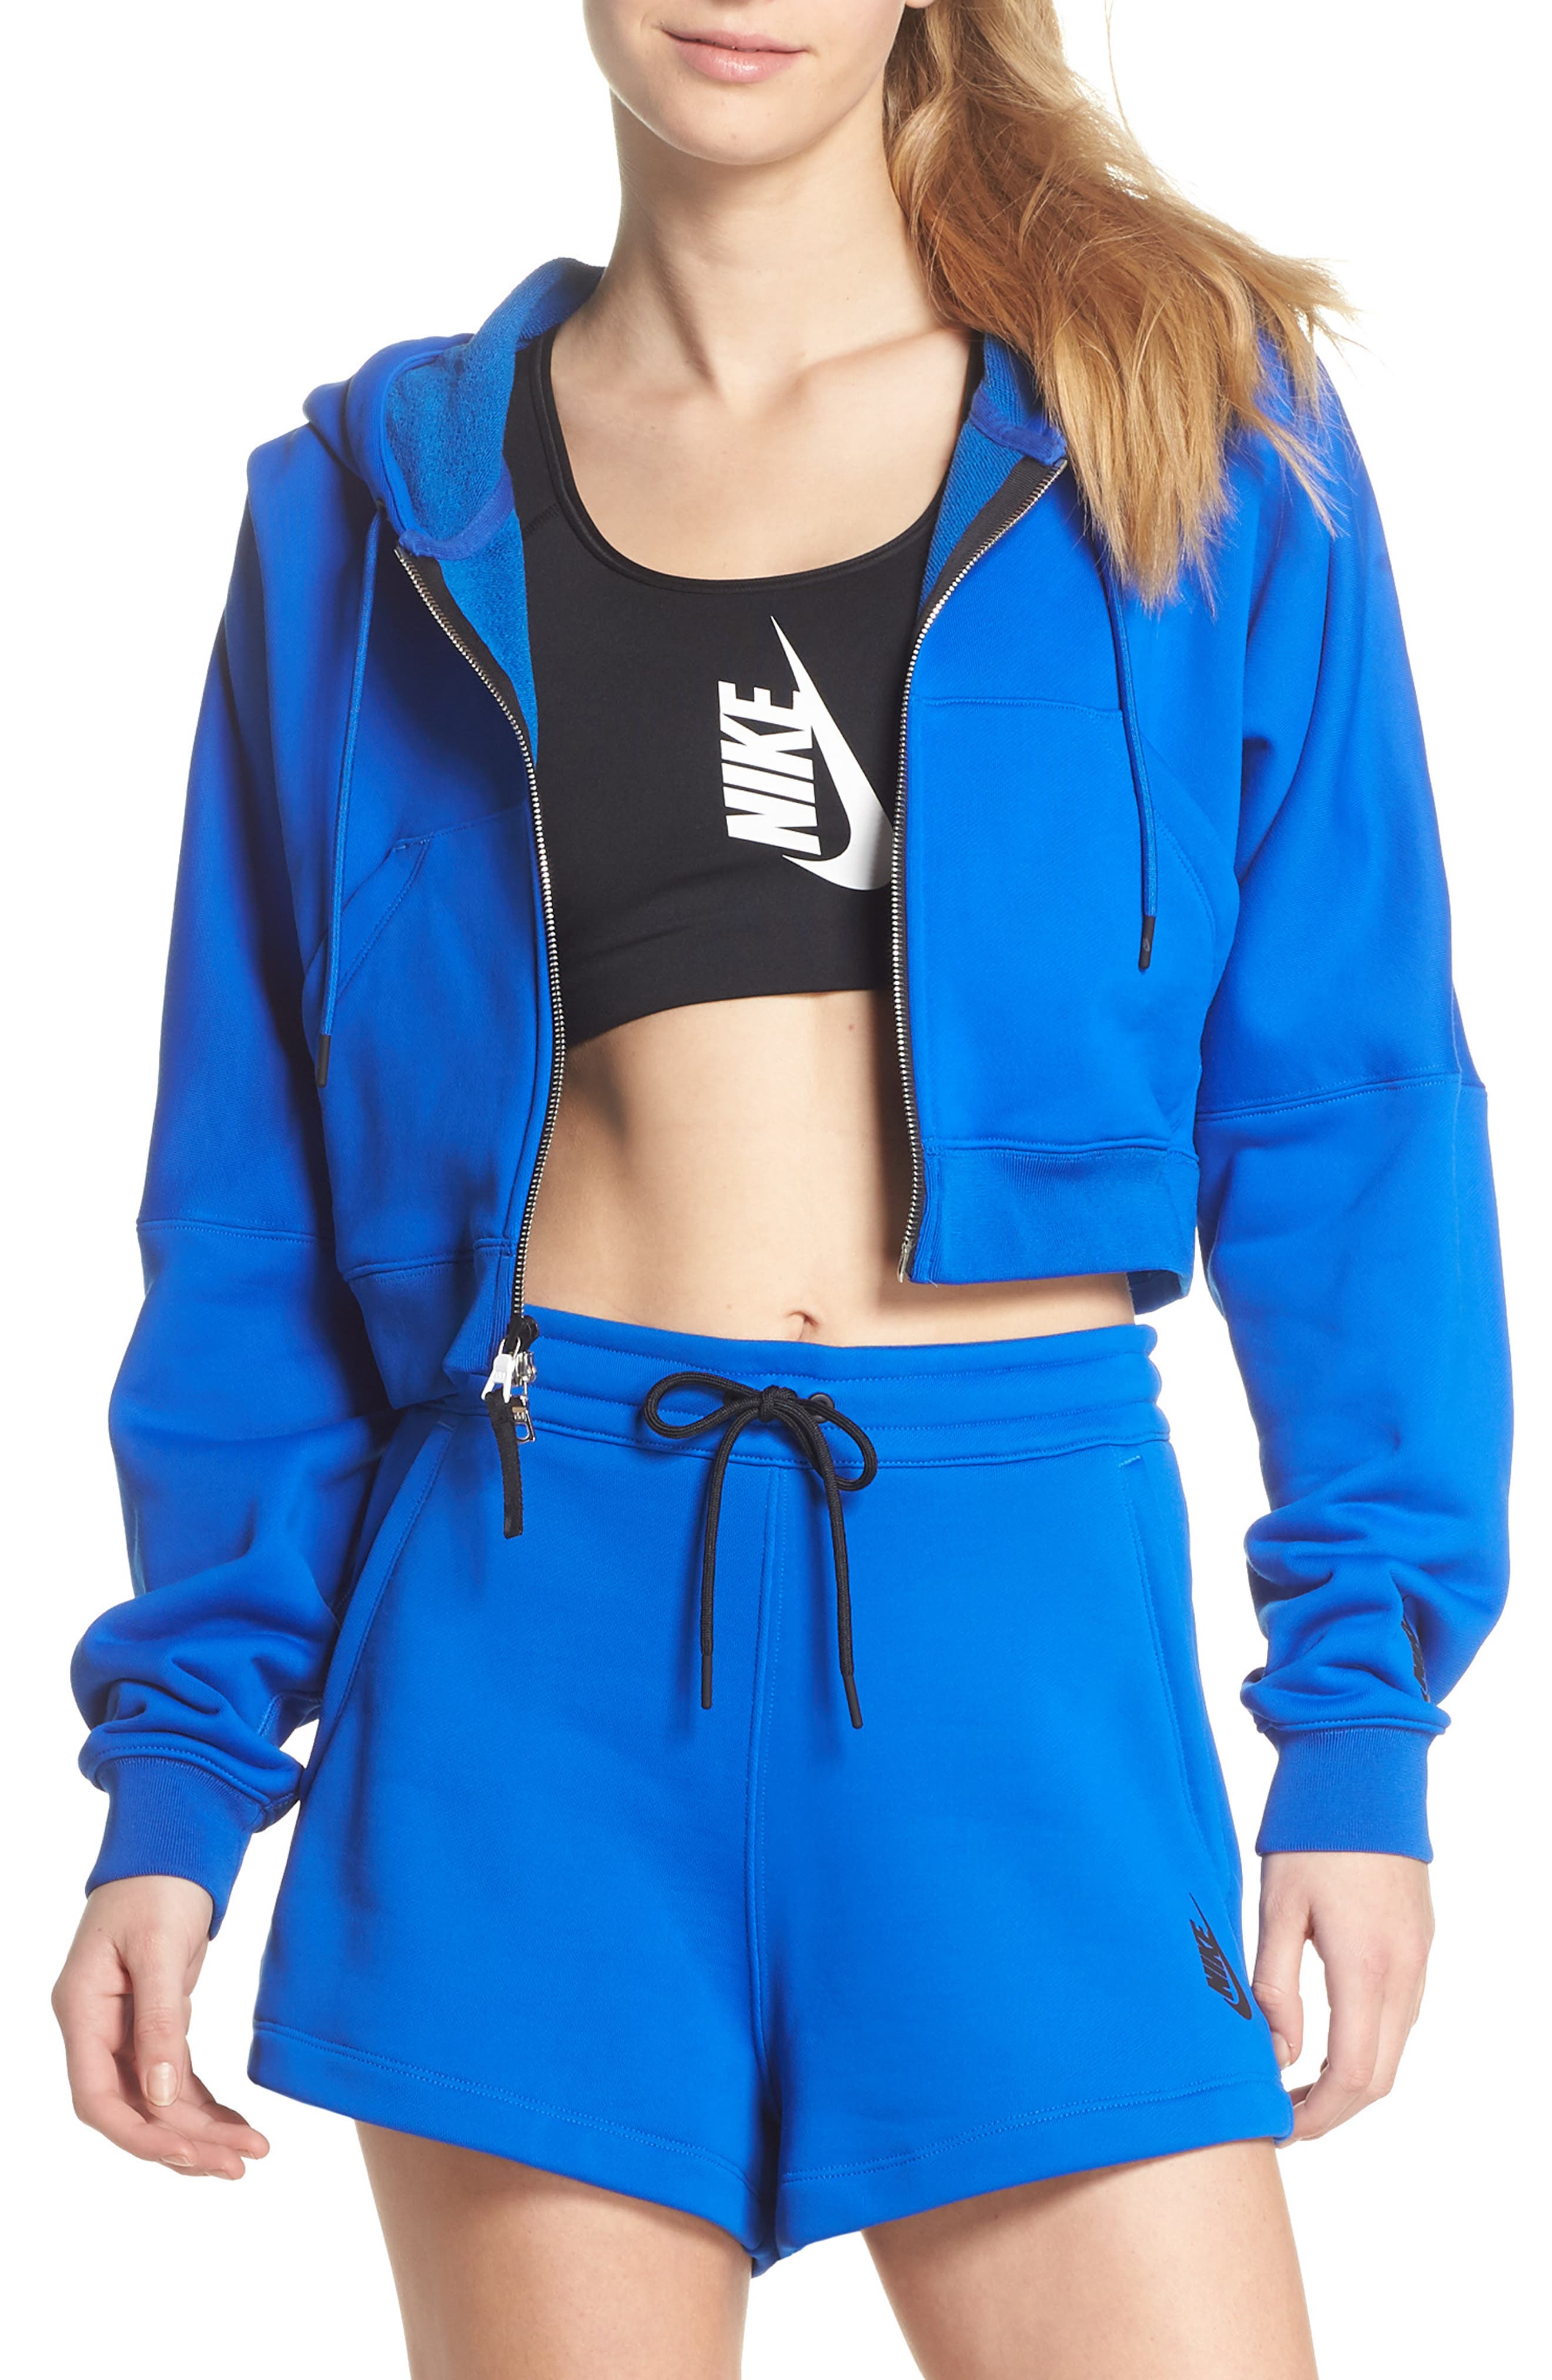 NikeLab Collection Terry Zip Hoodie,                             Main thumbnail 1, color,                             Hyper Cobalt/ Black